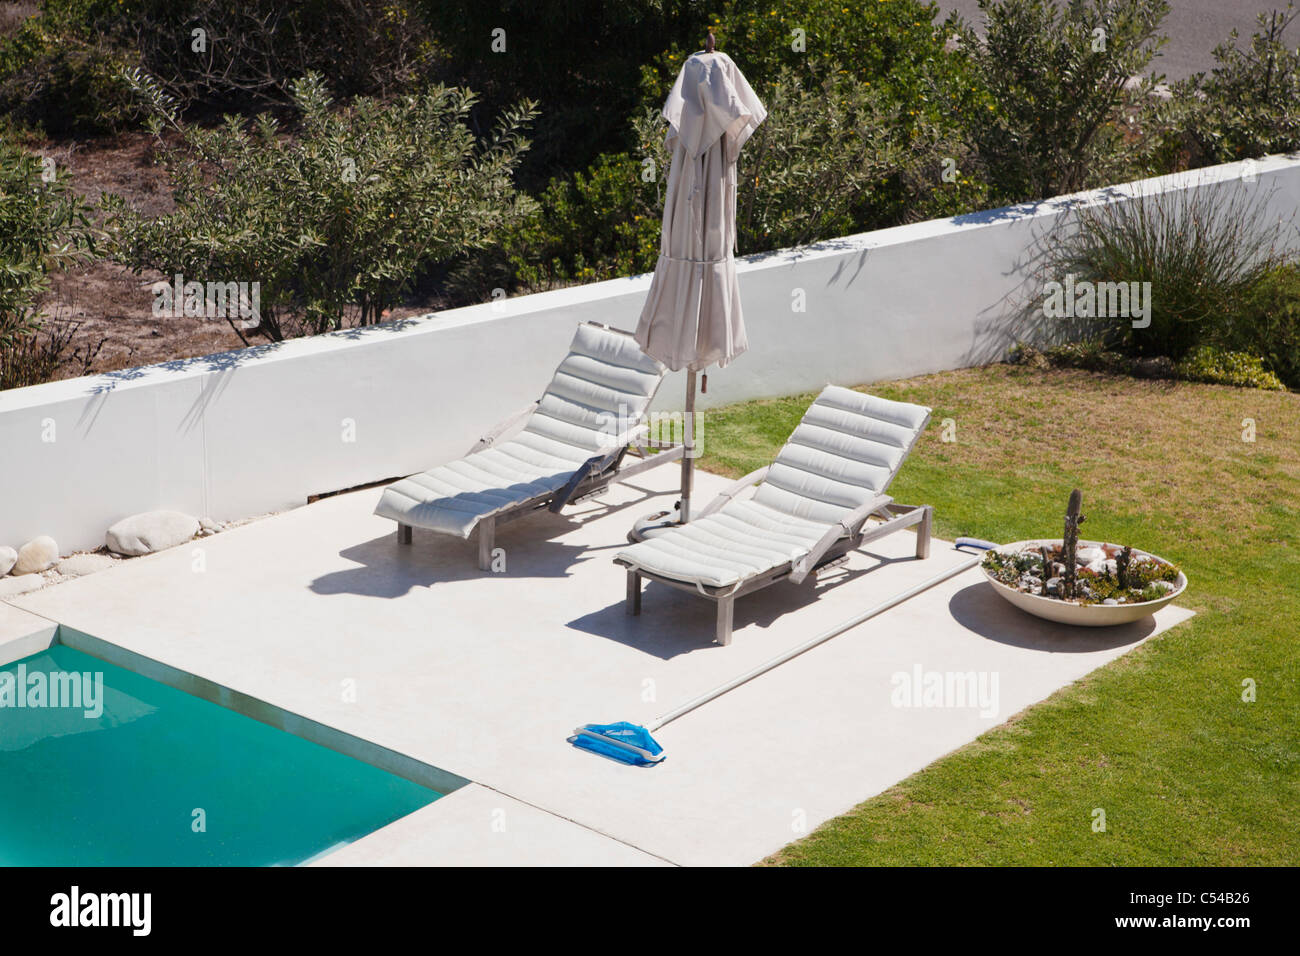 High angle view immagini high angle view fotos stock alamy for Sdraio bordo piscina